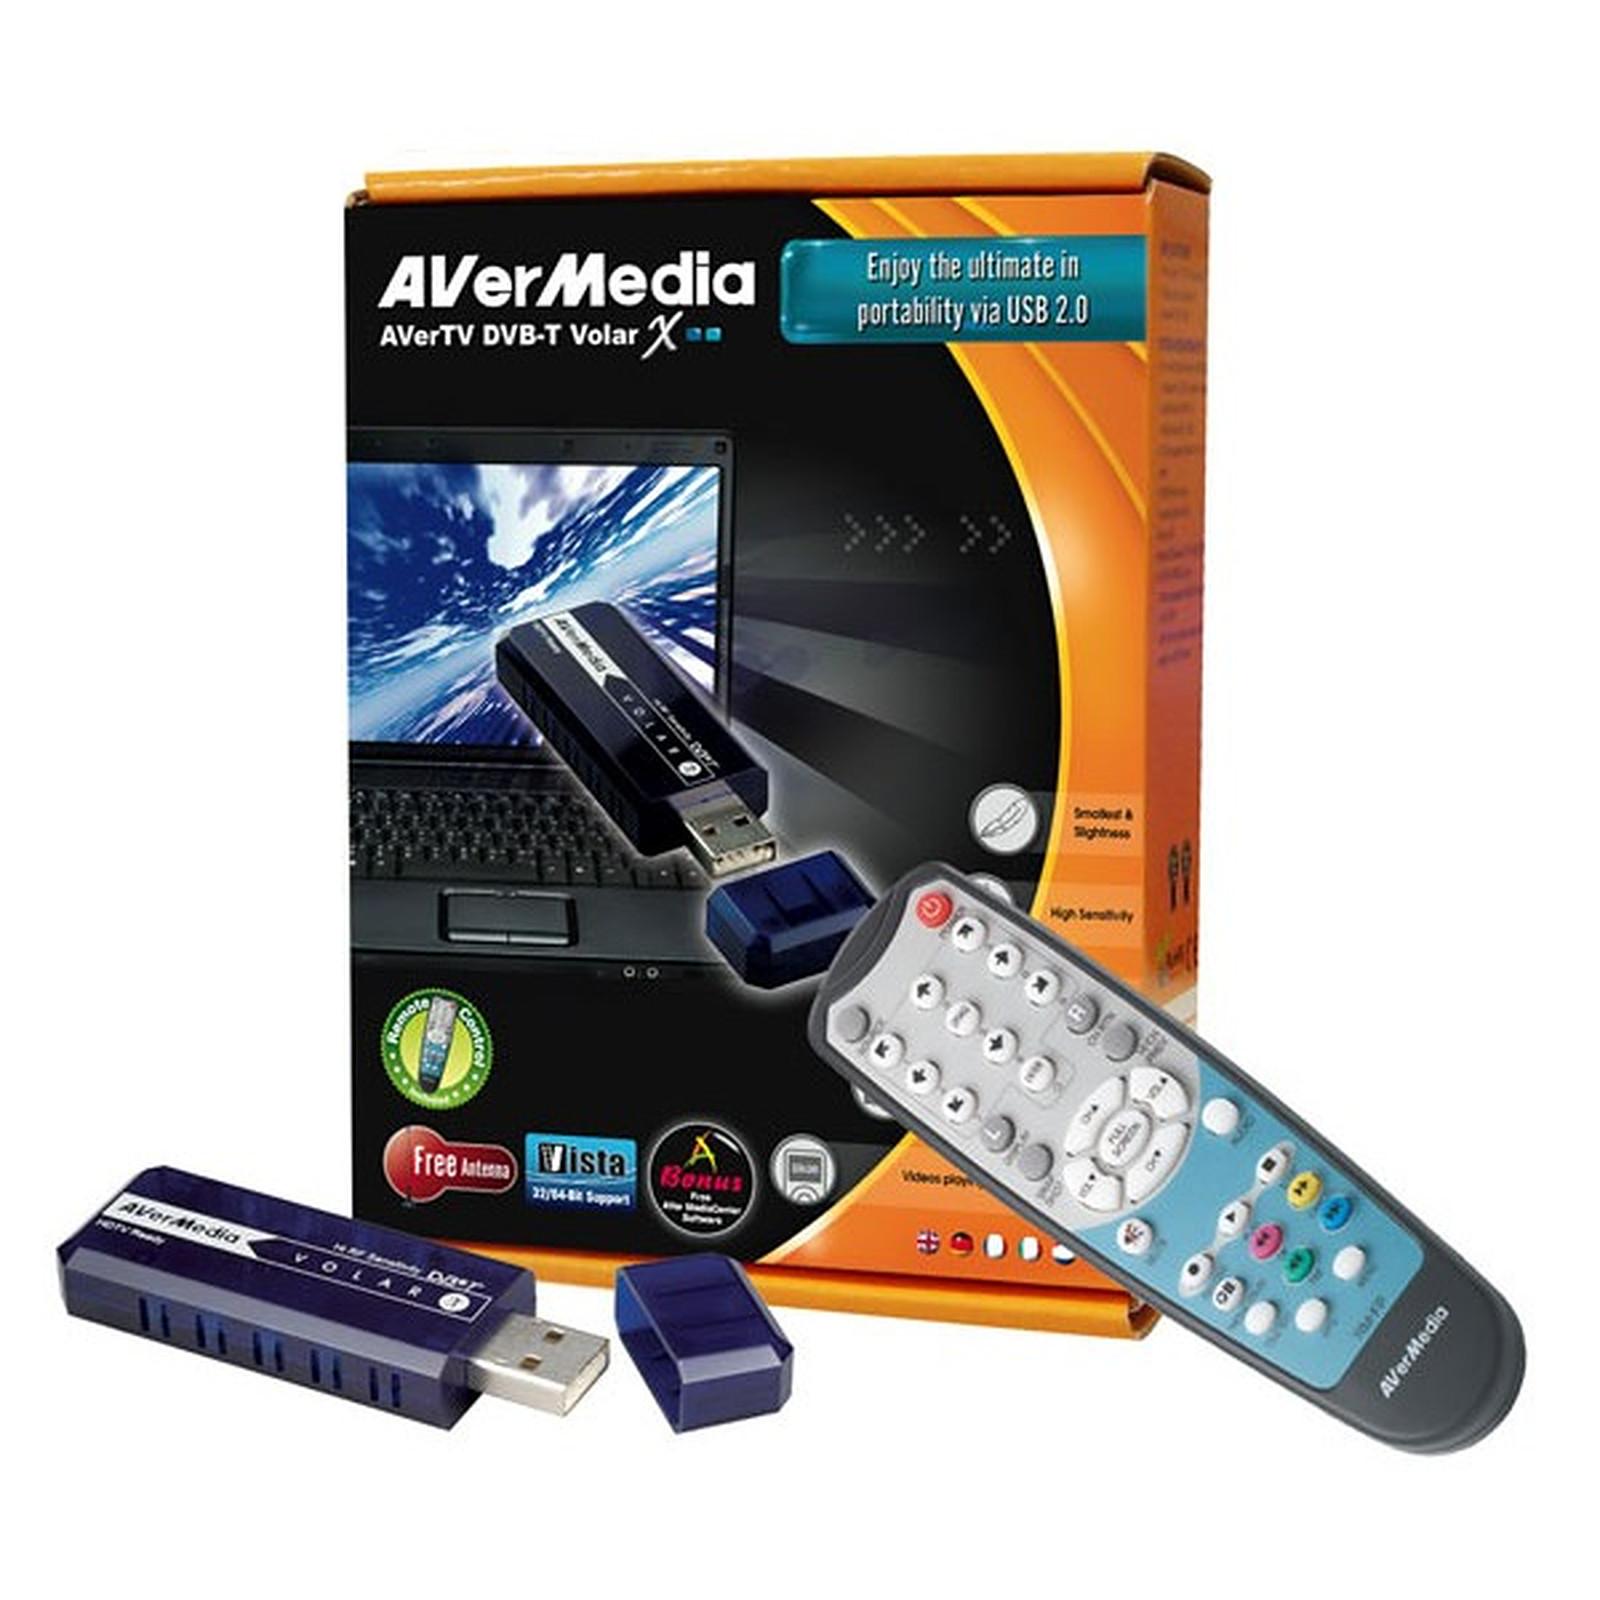 AVerMedia AverTV DVB-T Volar X